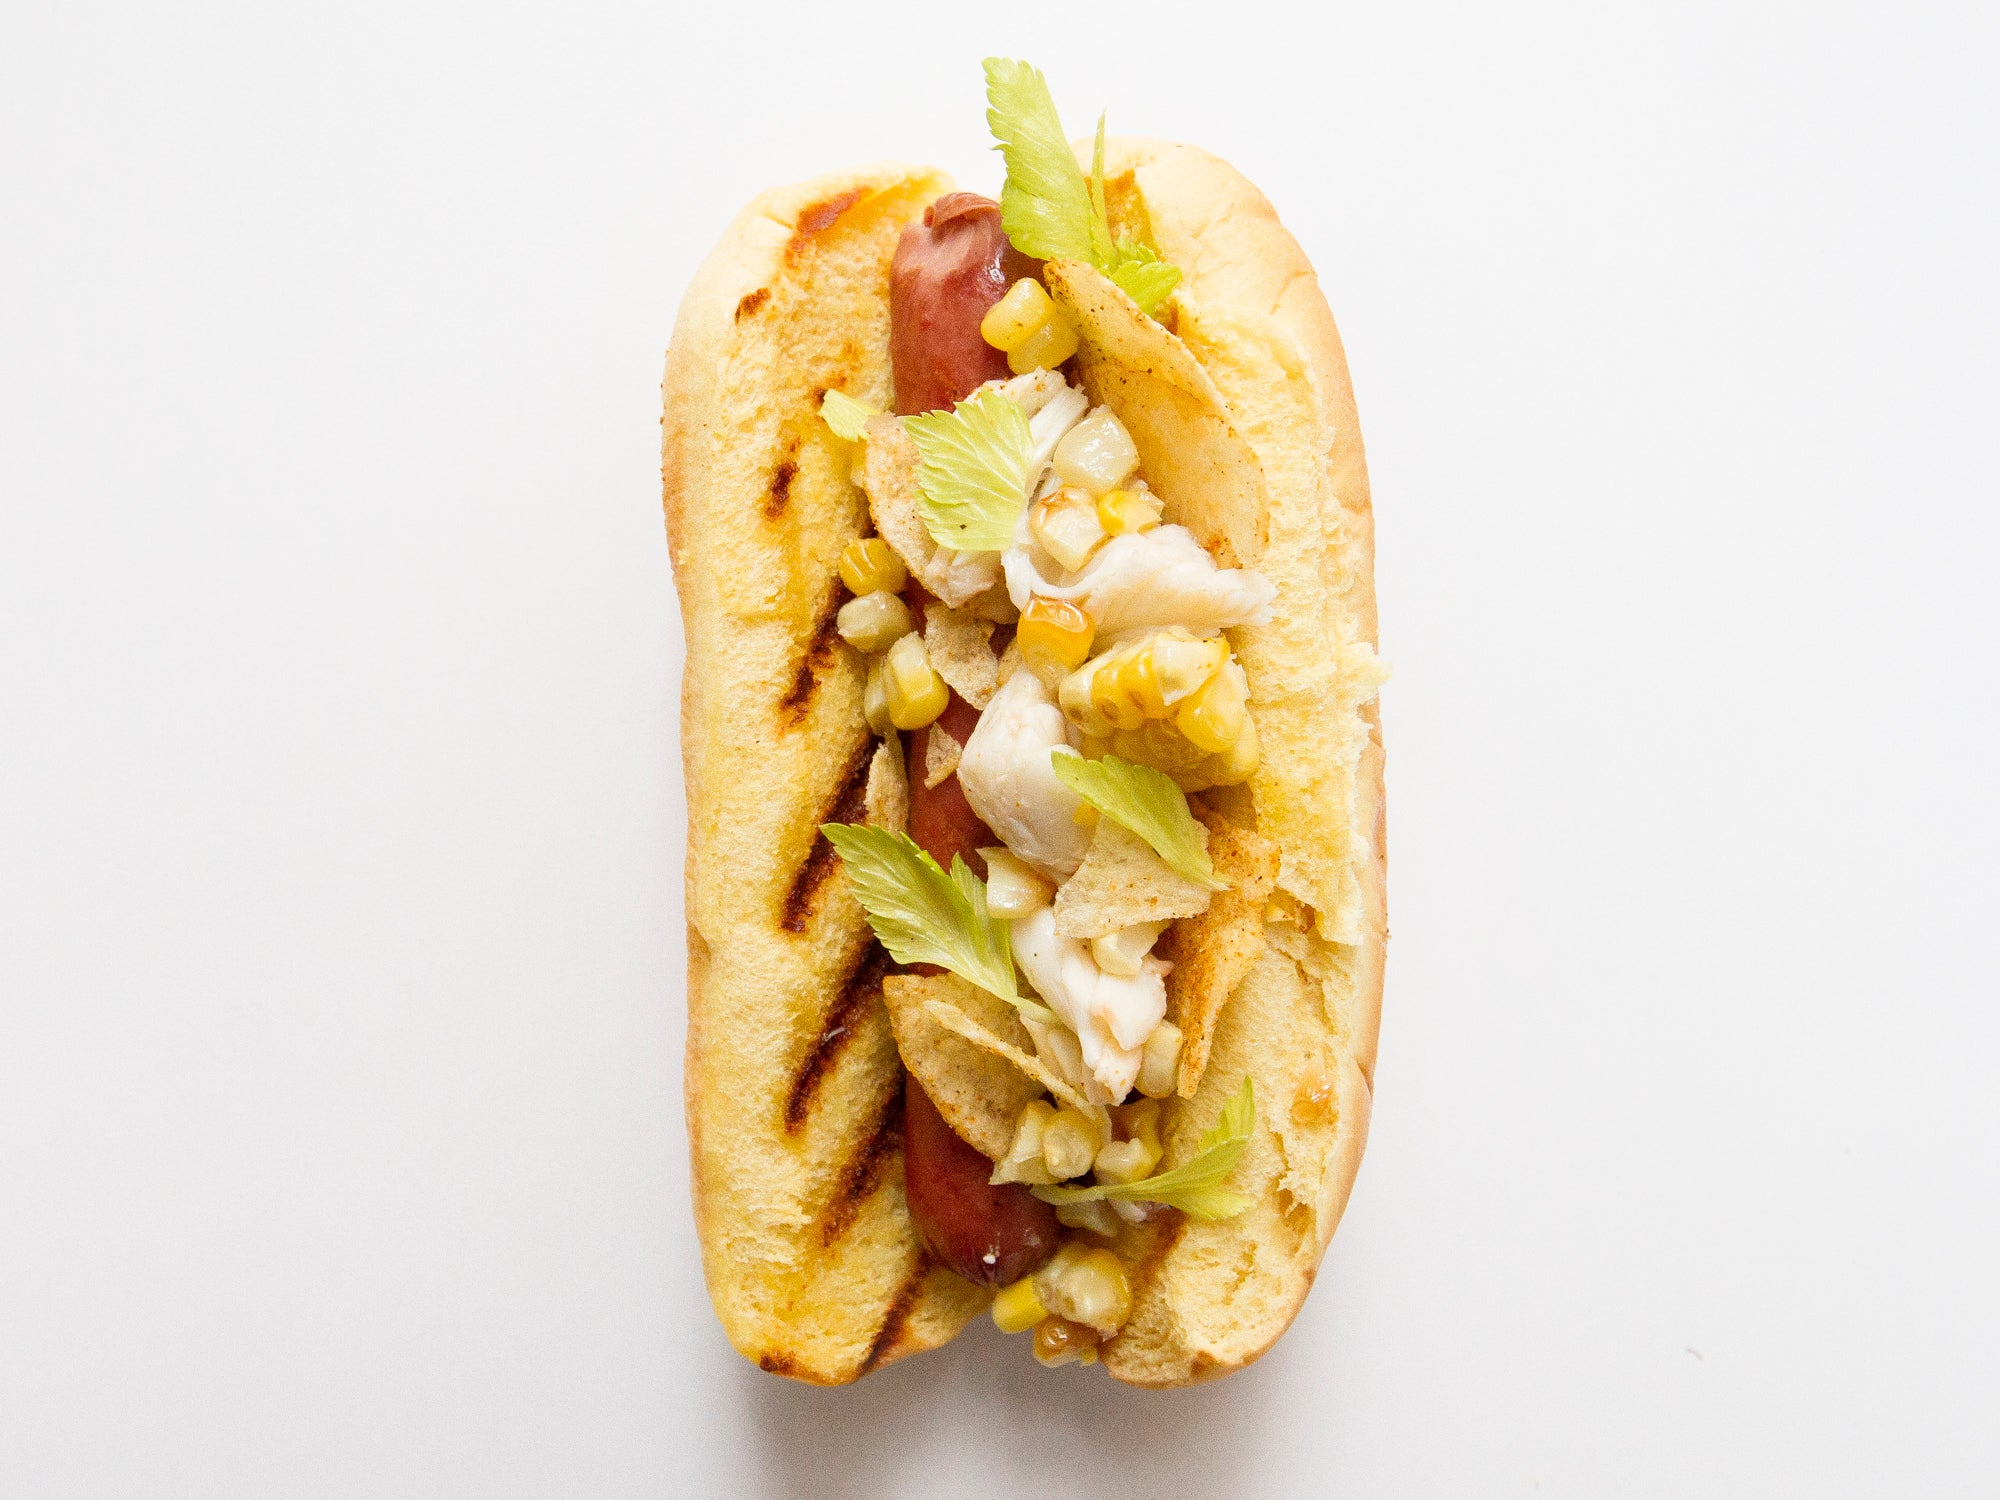 Maryland Crab Hot Dog